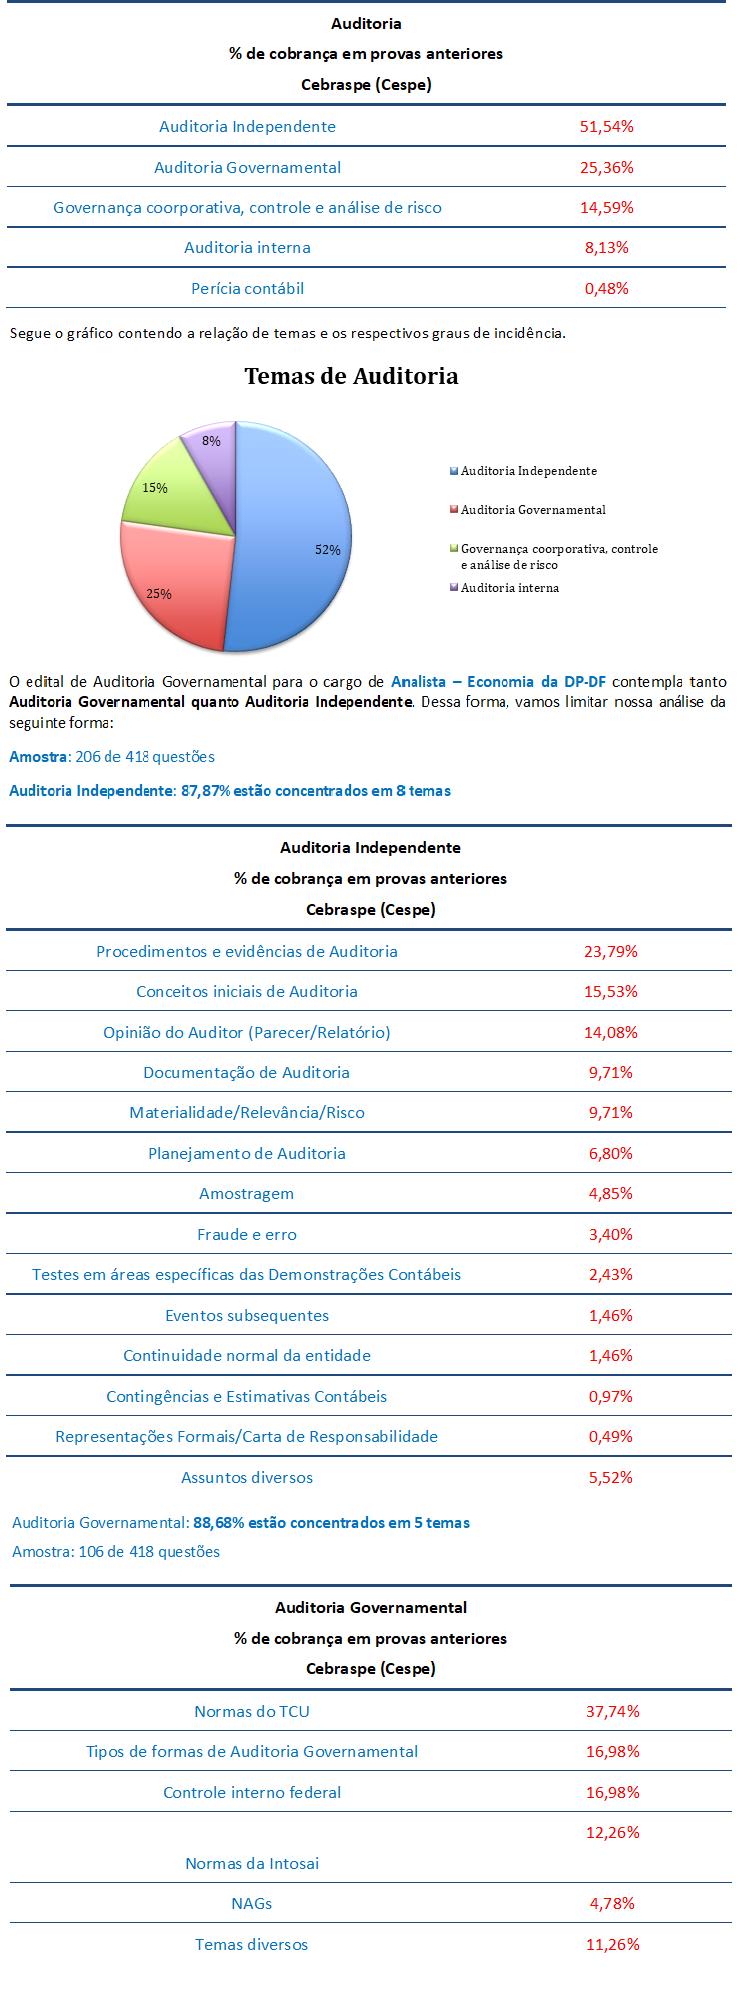 concurso, passo, Auditoria para Analista de Apoio-Economia DPDF